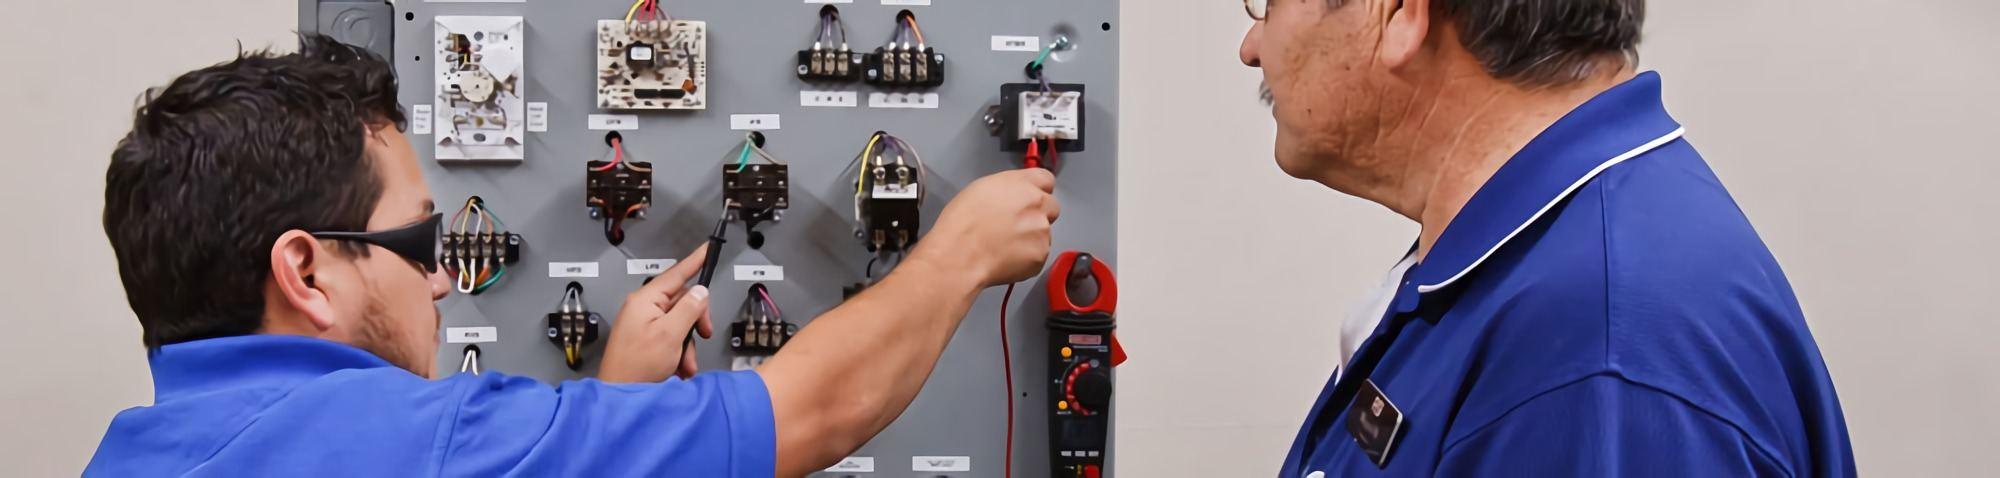 RSI Refrigeration School Training Equipment Faculty Student